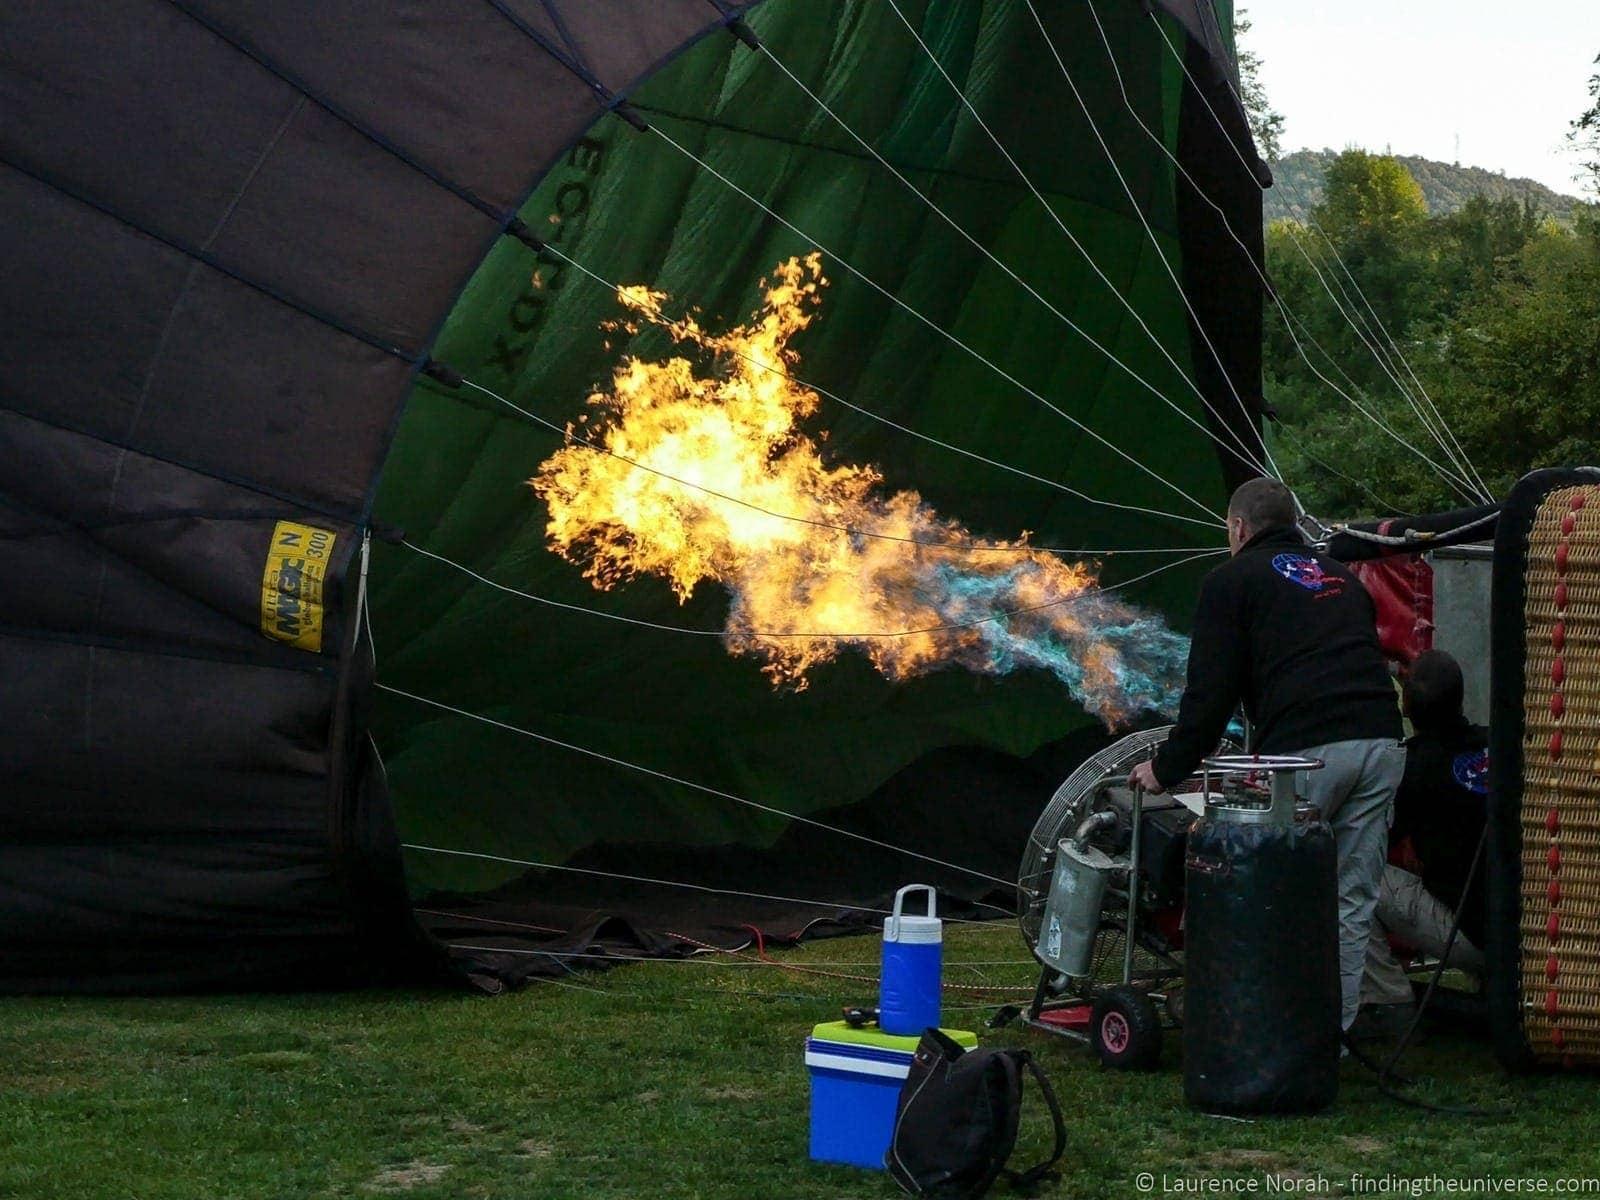 Balloon Vol de Coloms Costa Brava